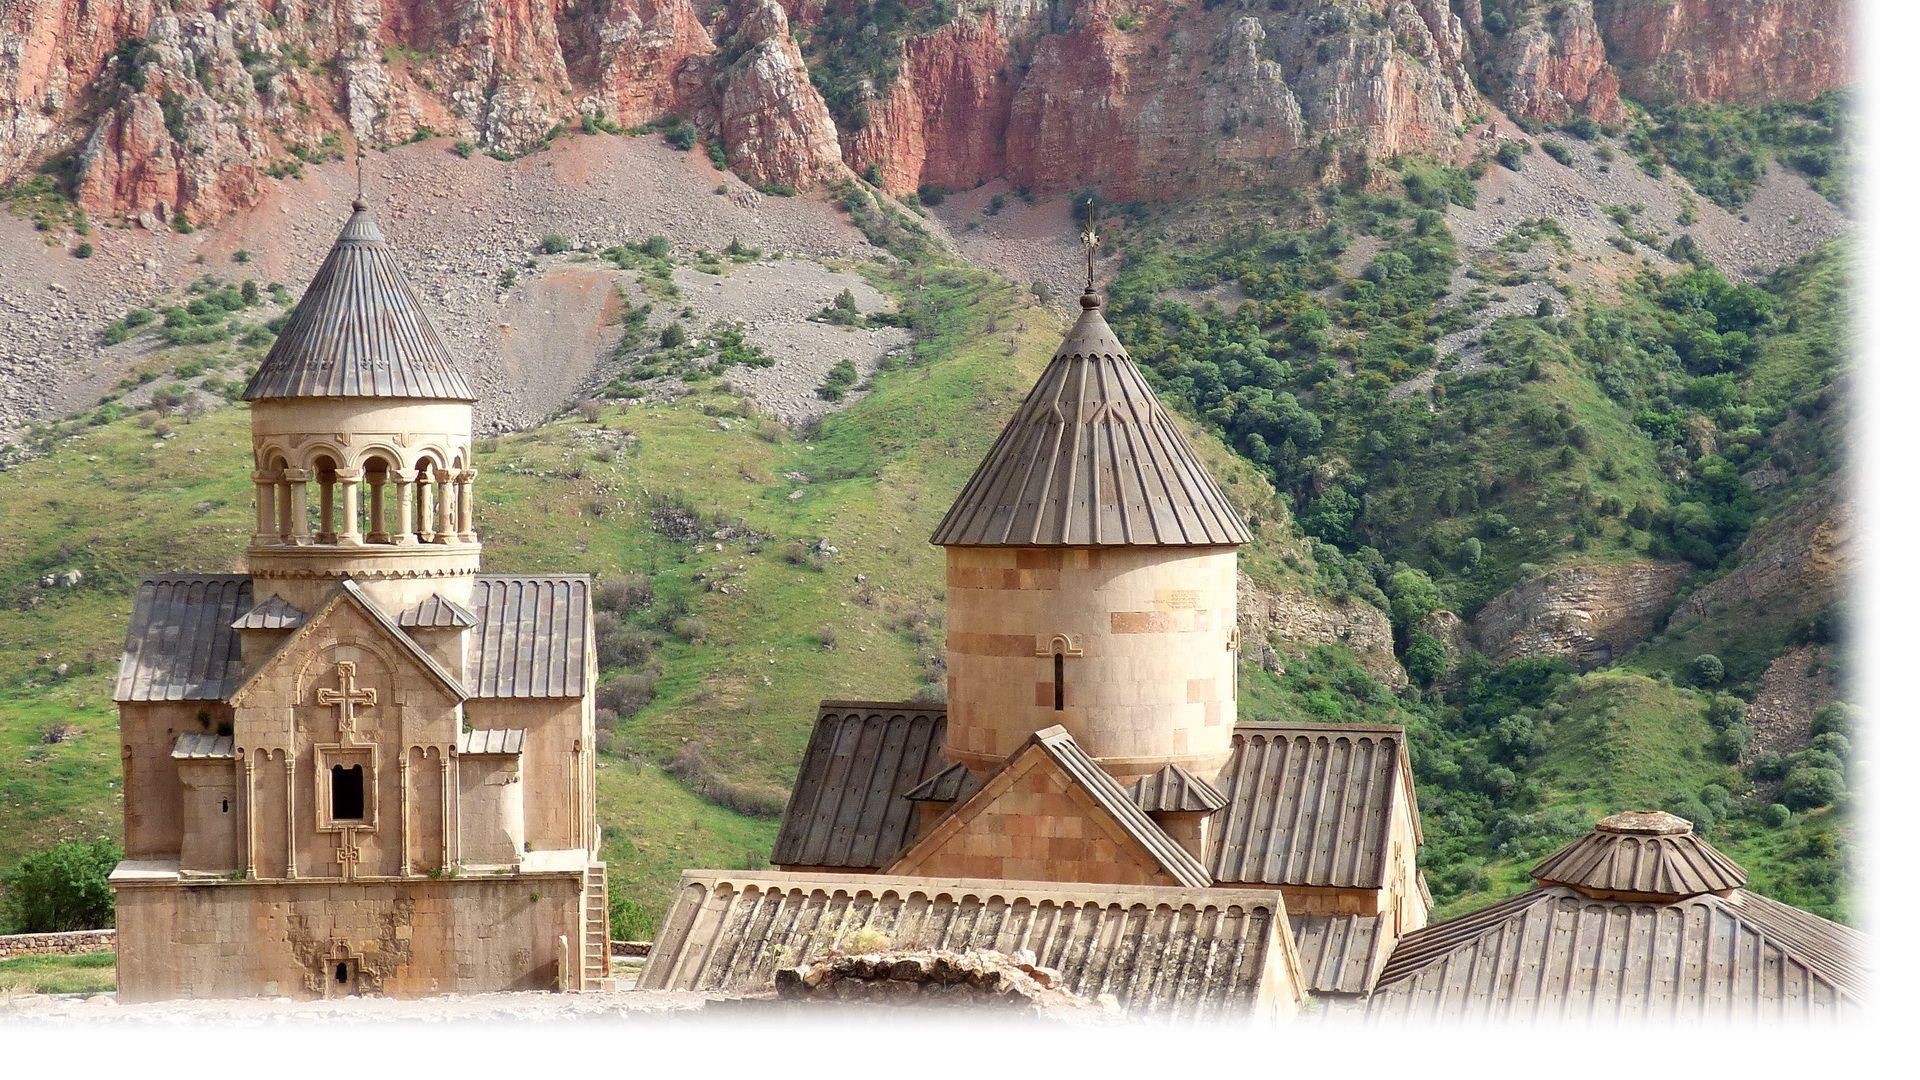 2Gruzja i Armenia